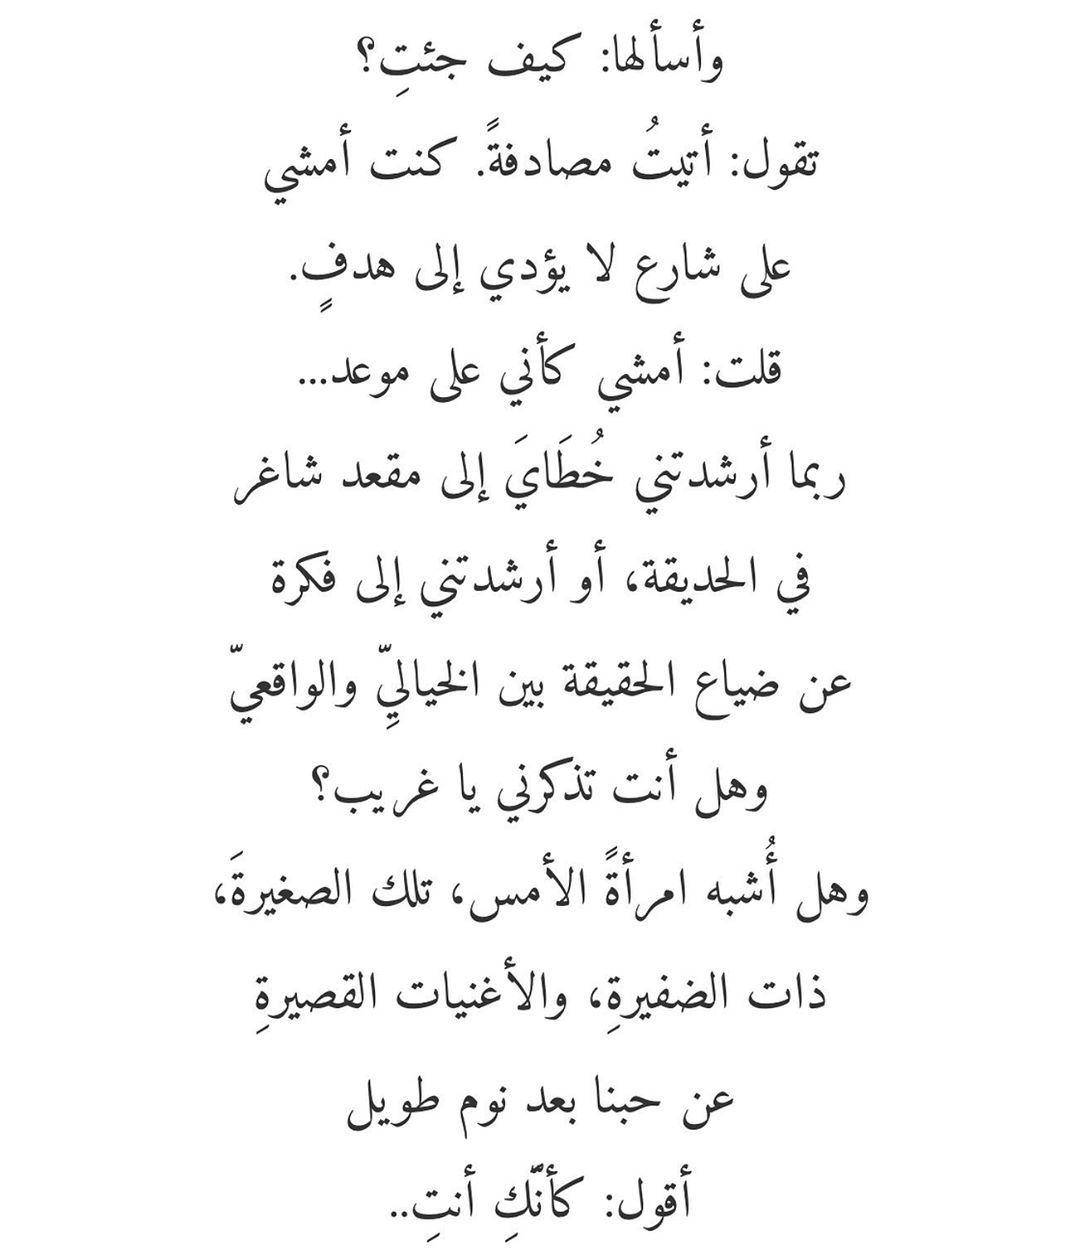 877 Mentions J Aime 13 Commentaires Mahmoud Darwish محمود درويش Darwish Fb Sur Instagram وتسأل ماذا تقول أقول لها Math Literature Math Equations